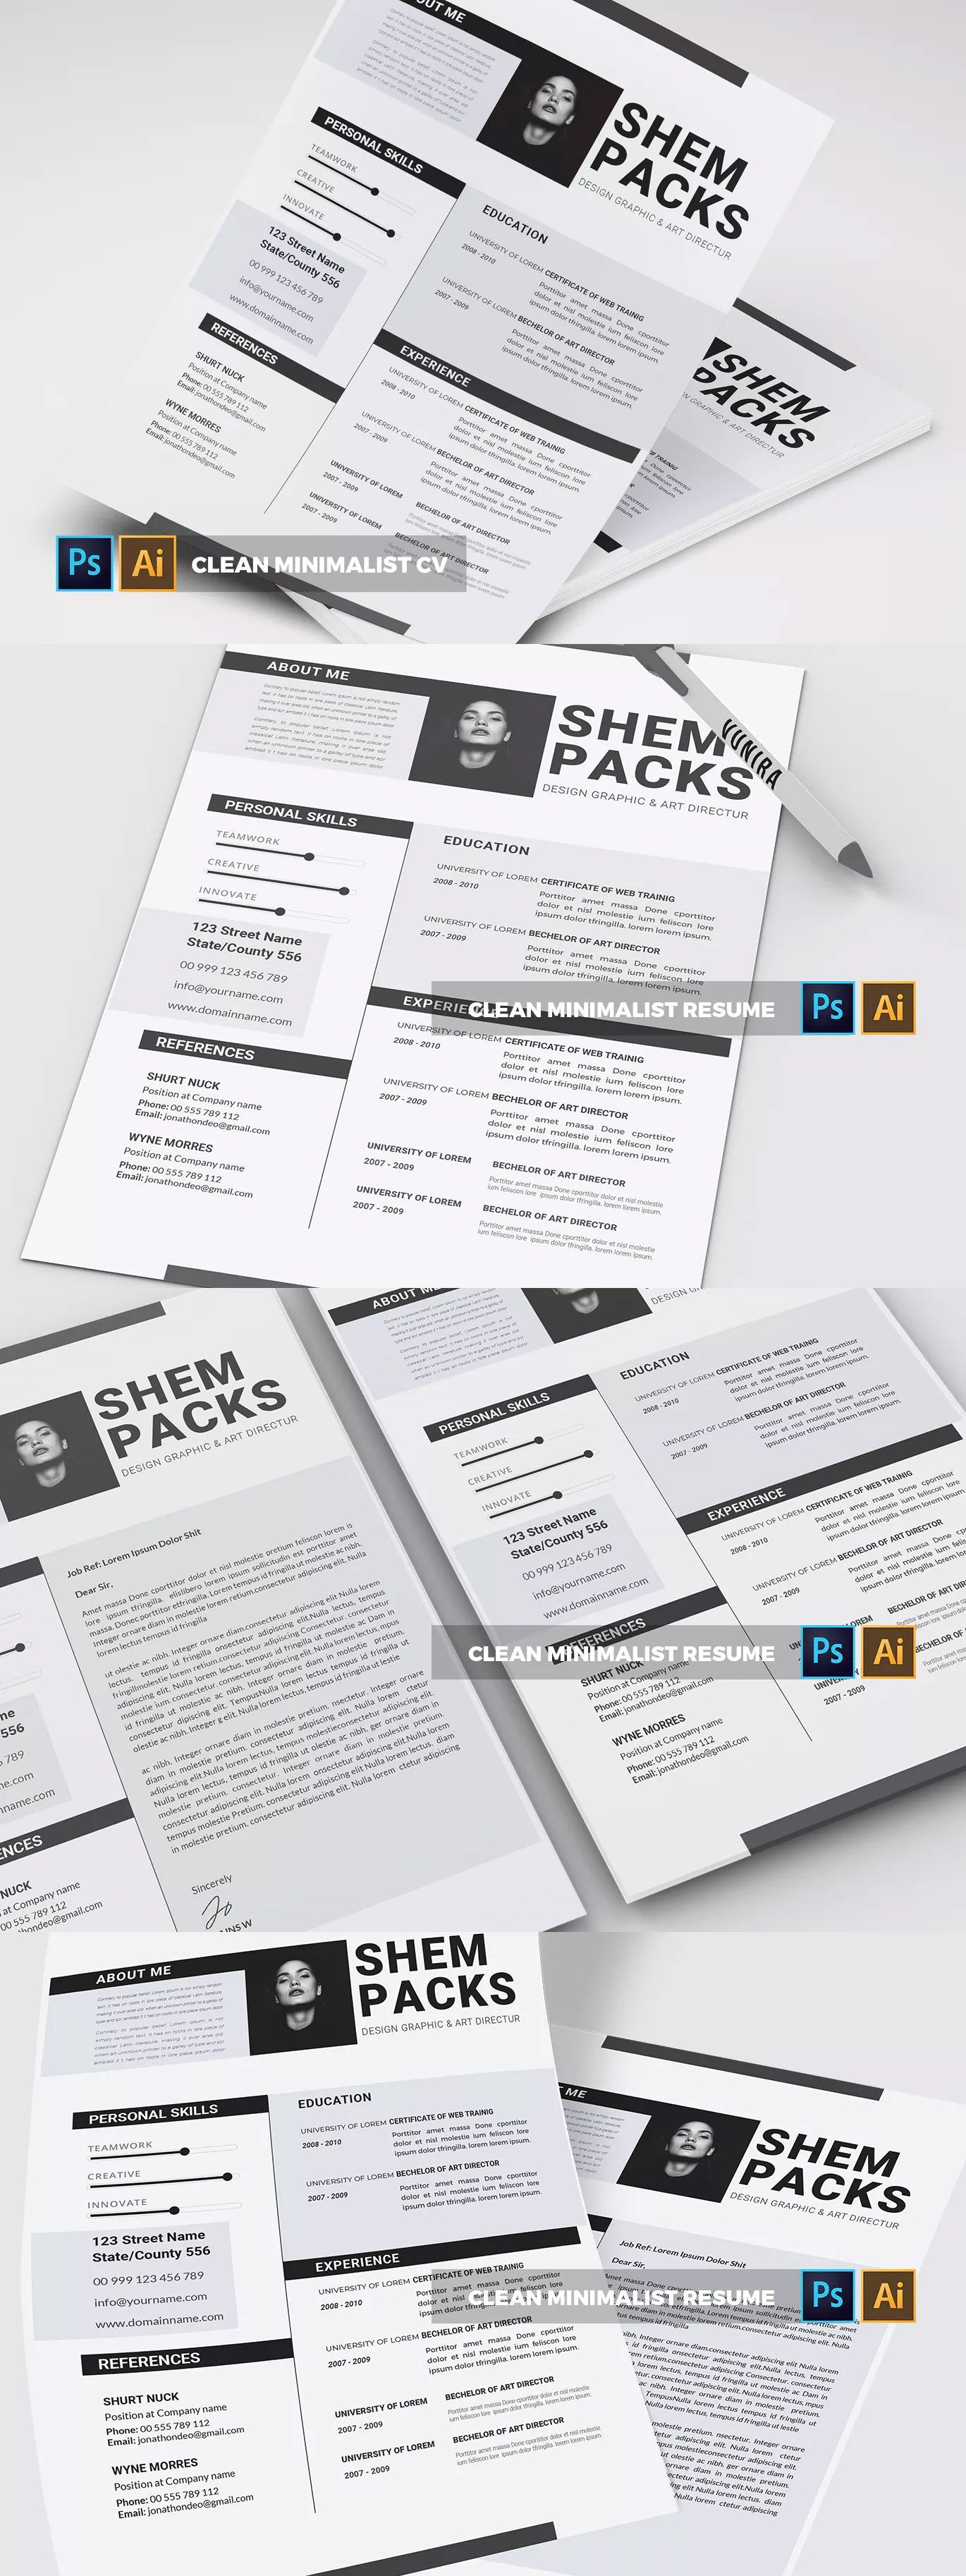 Clean Minimalist CV & Resume Template AI, EPS, PSD